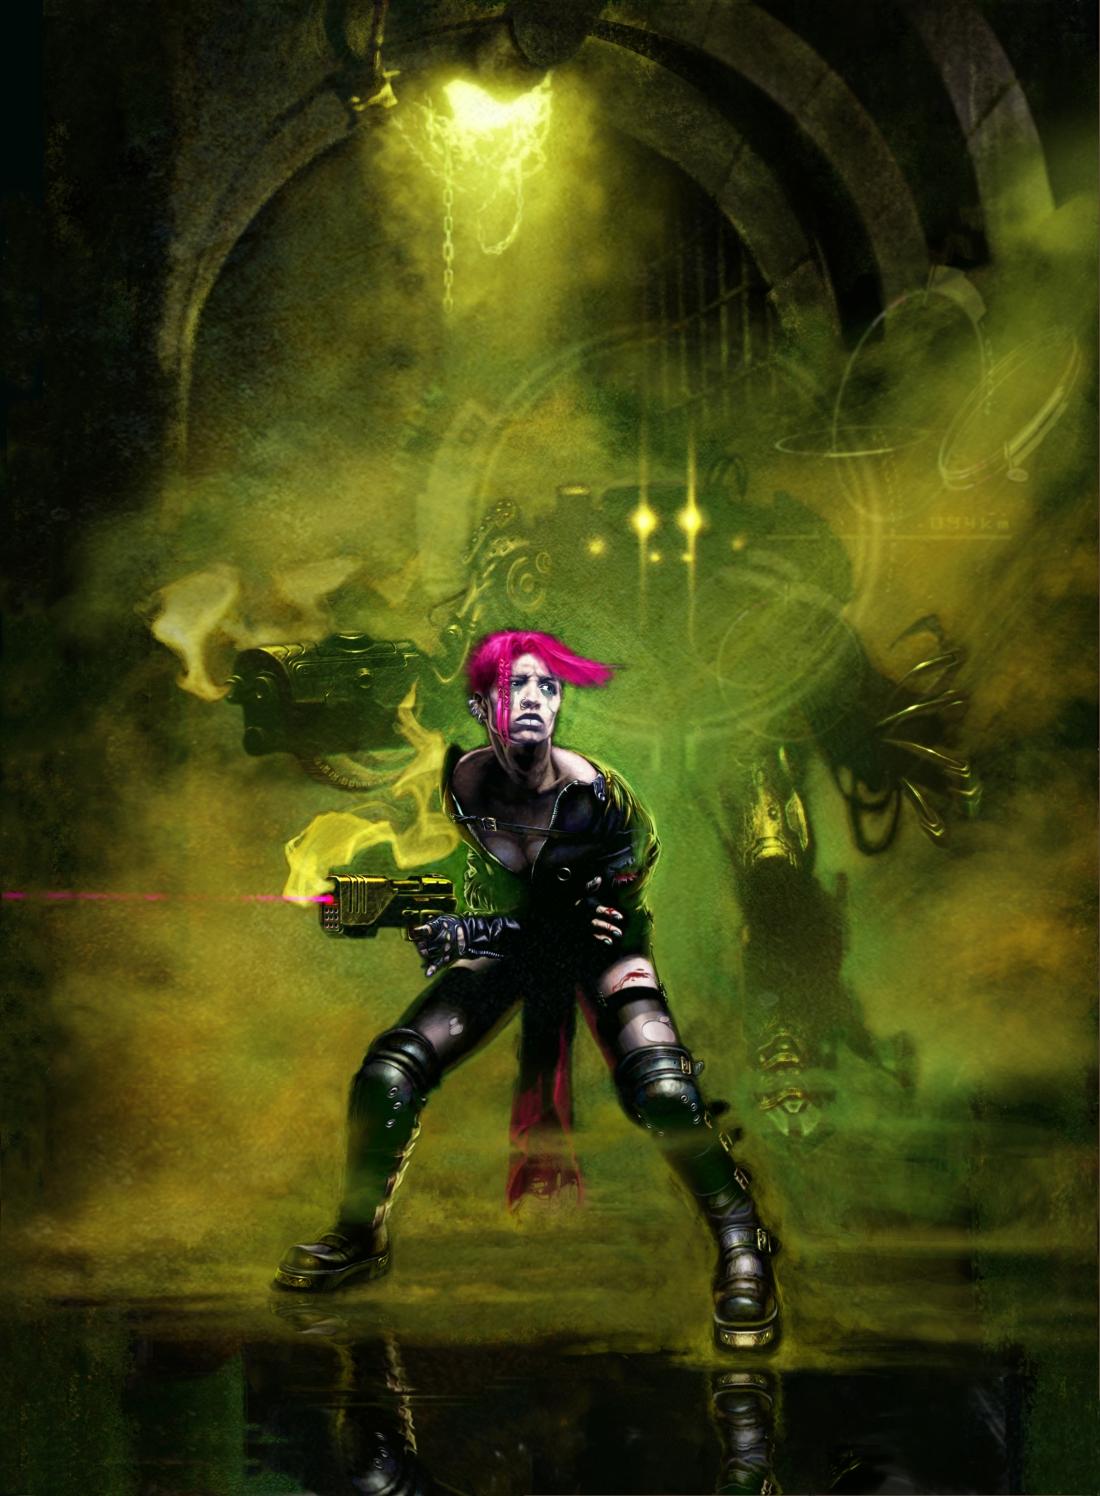 Gary_Freeman_Science_Fiction_Illustration_Girl_Robot